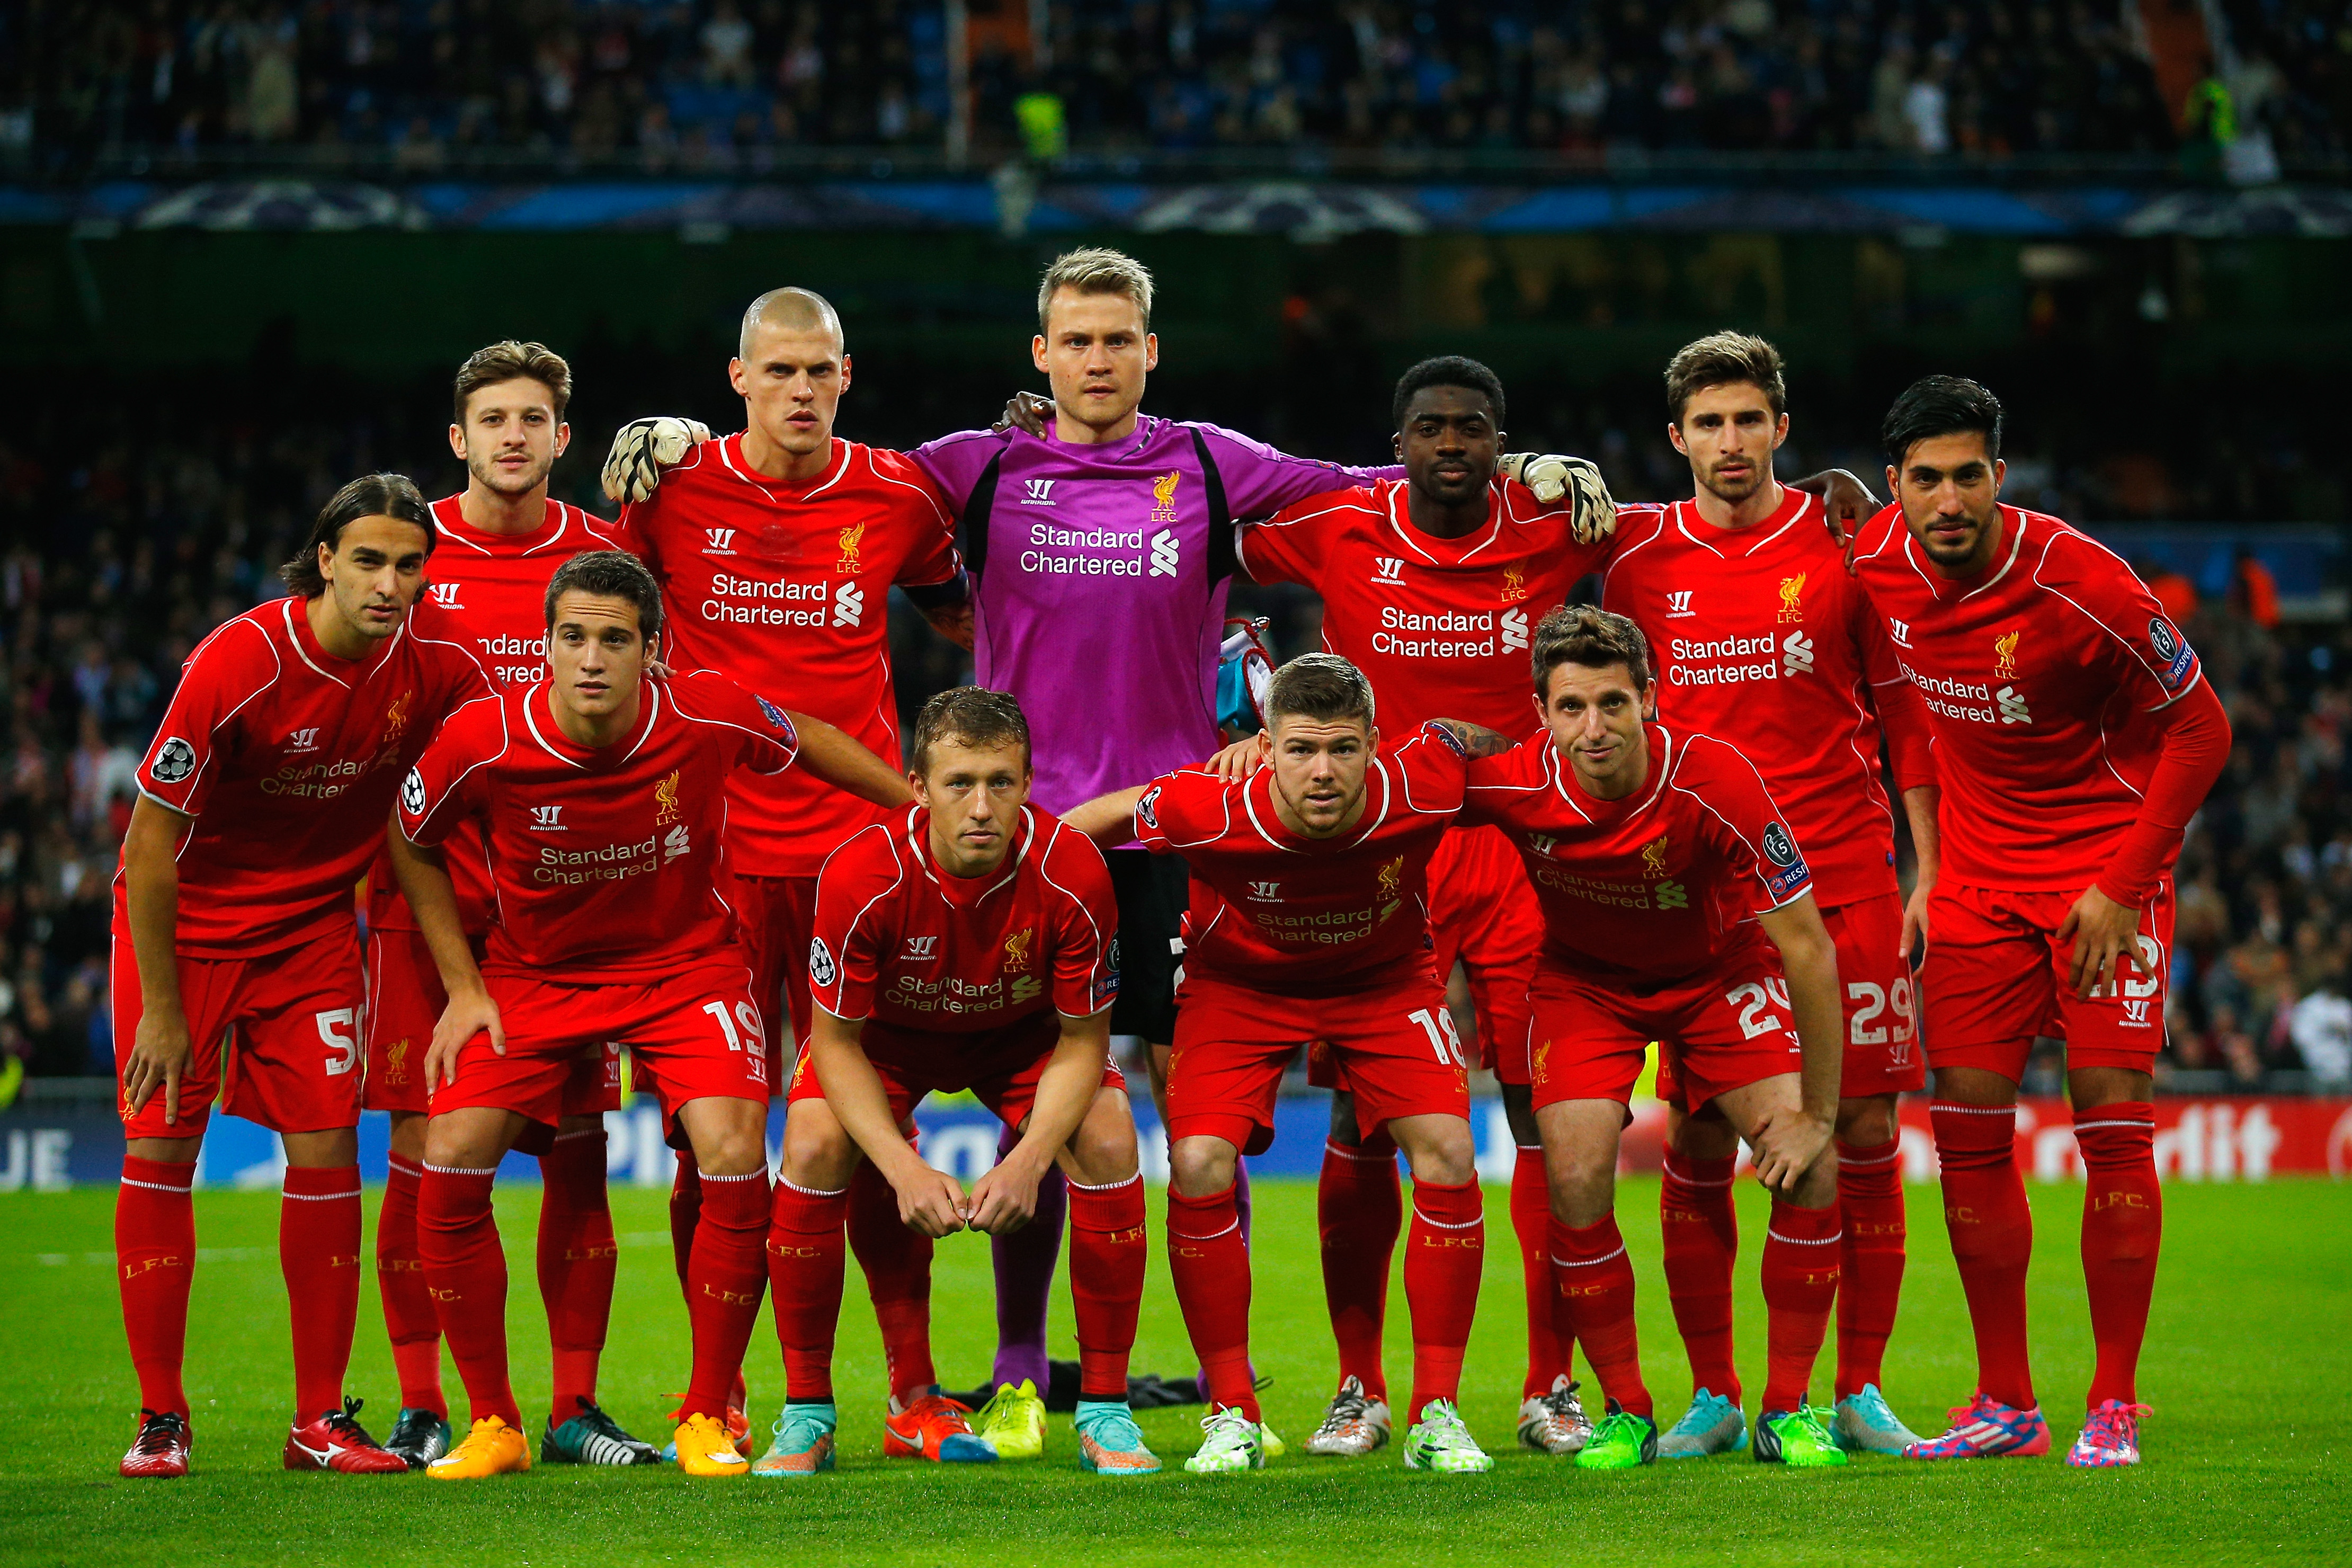 Прогноз на матч Ливерпуль - Манчестер Юнайтед 17 октября 2016